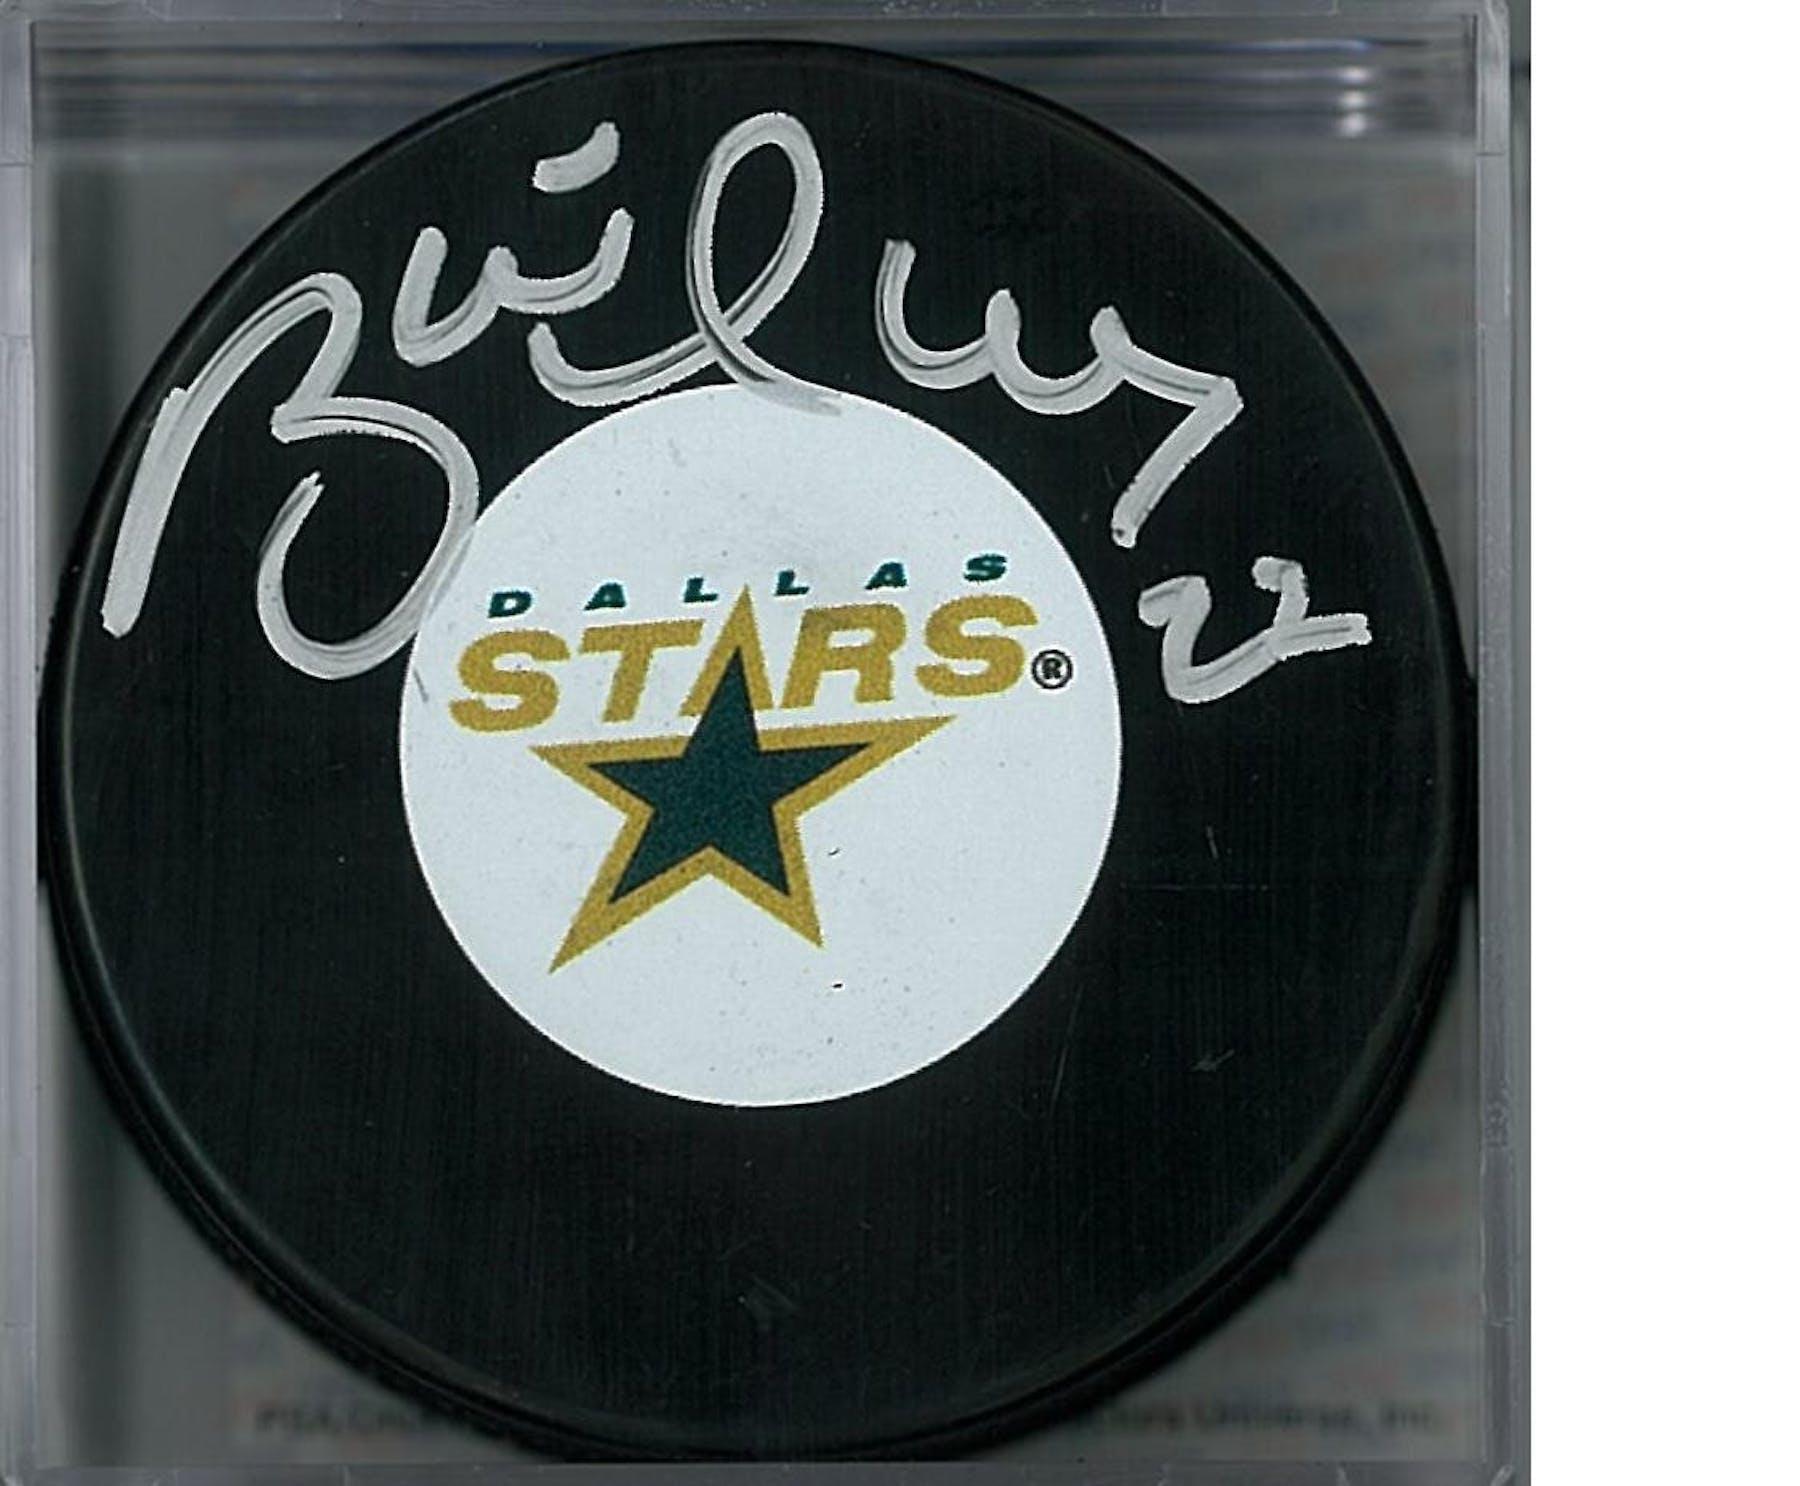 buy online af961 cc729 Brett Hull Autographed Dallas Stars Hockey Puck (PSA COA)